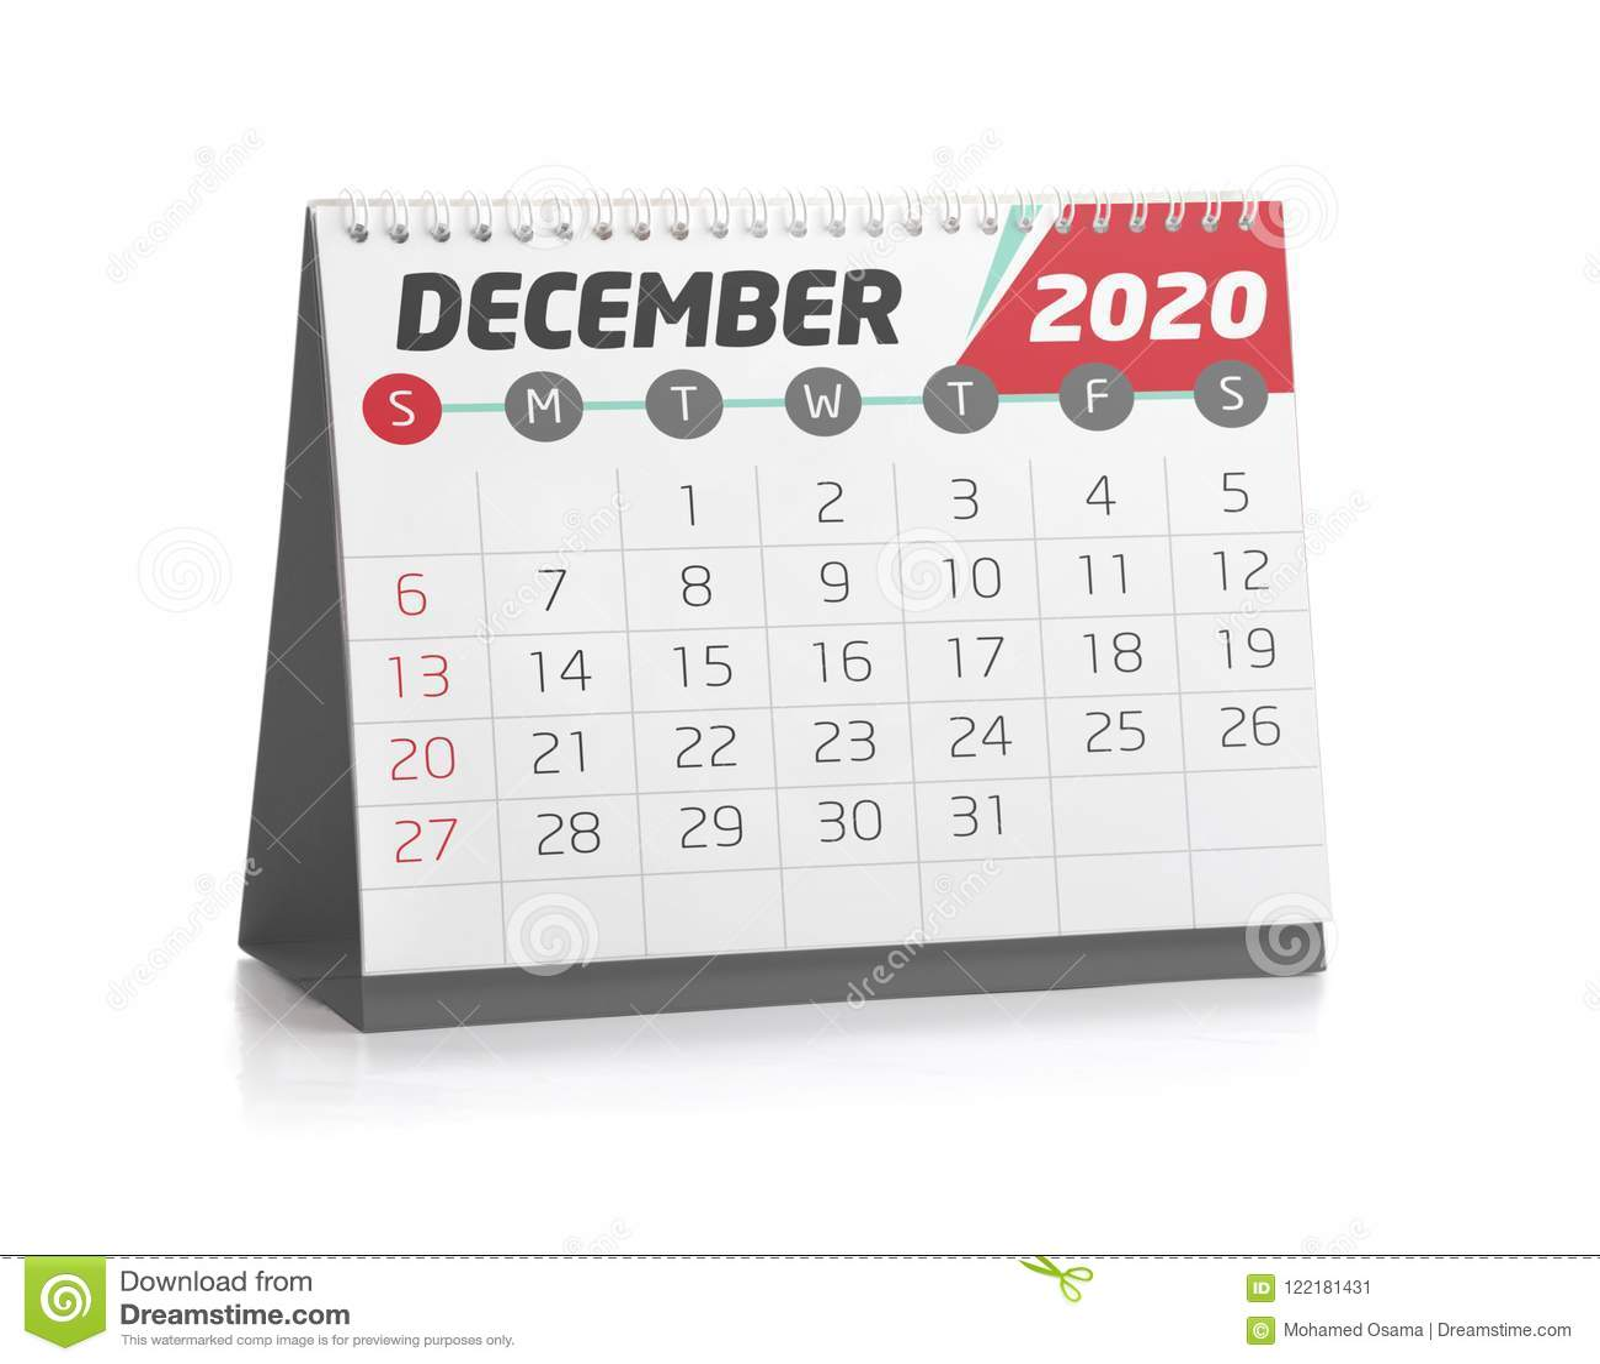 Calendrier De Decembre 2020.Bureau Calendrier En Decembre 2020 Illustration Stock